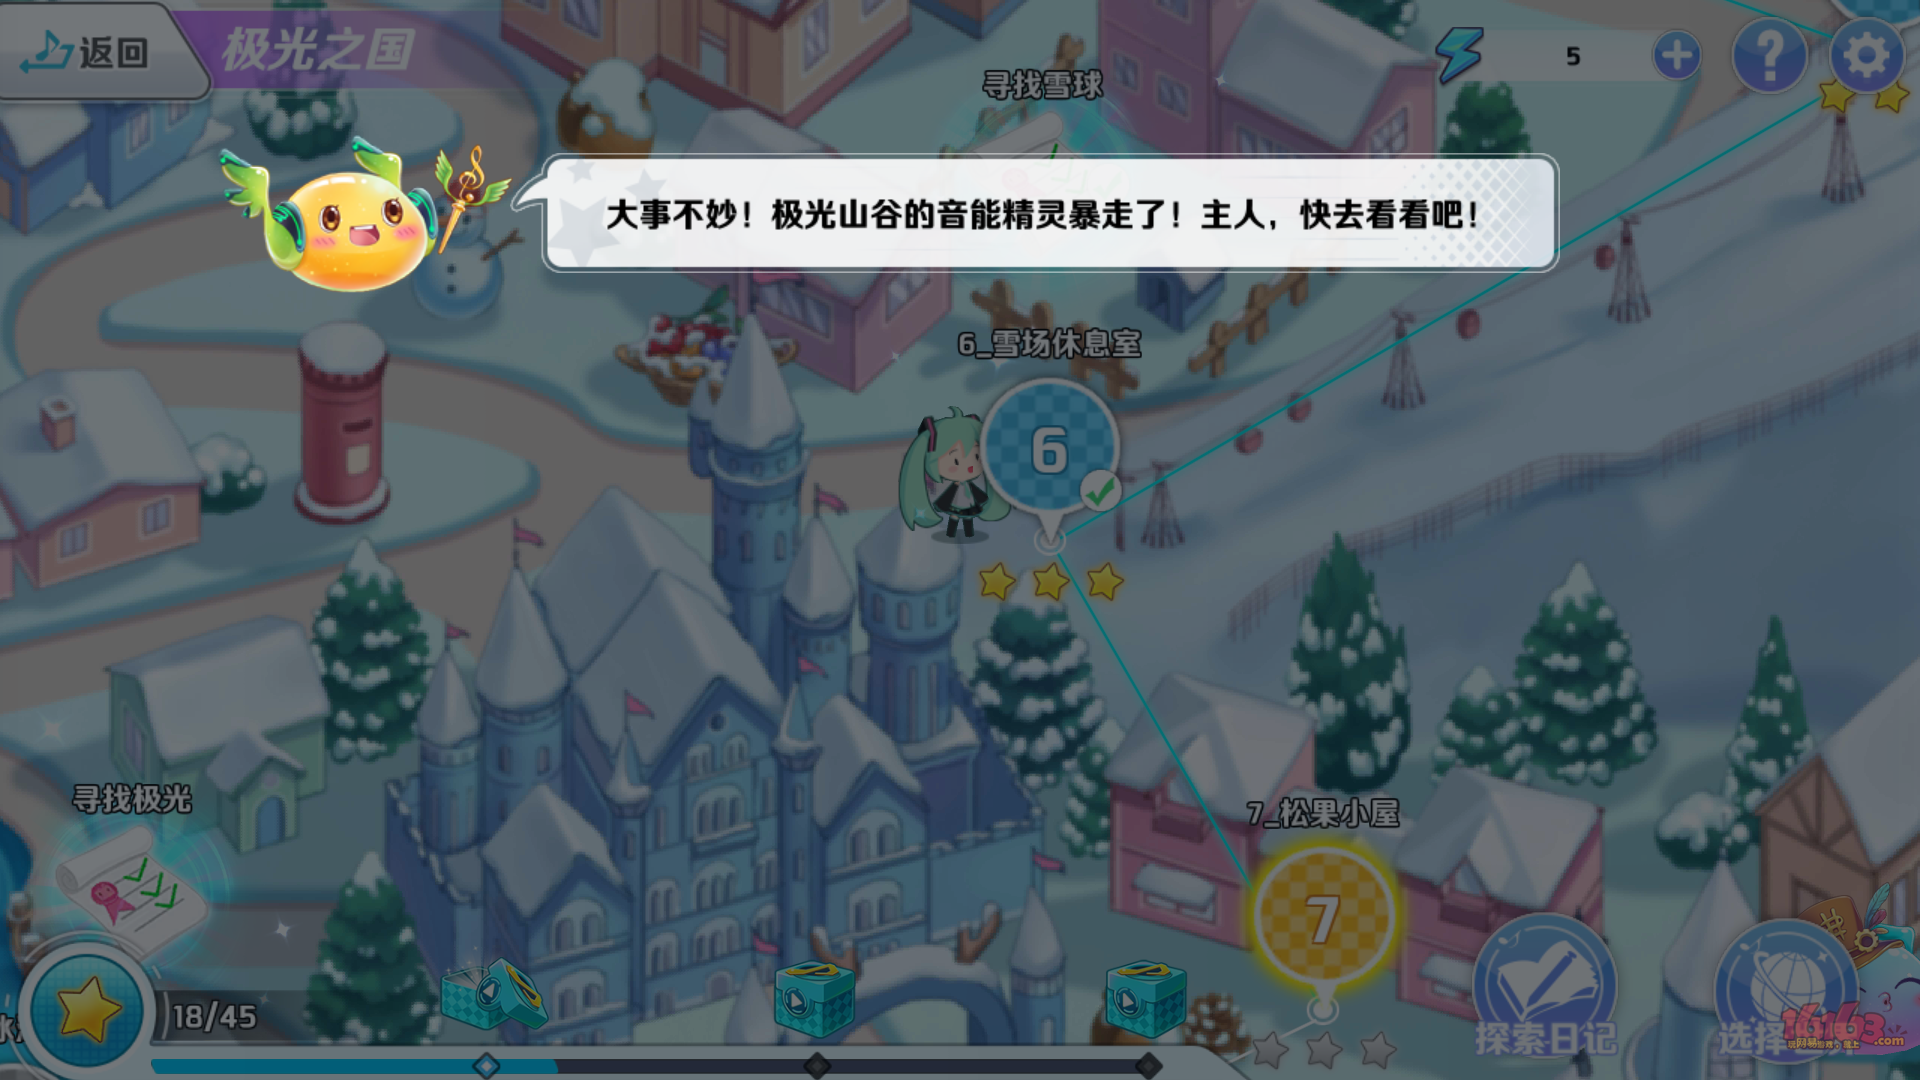 Screenshot_2017-12-28-01-01-25-404_com.netease.cy.png